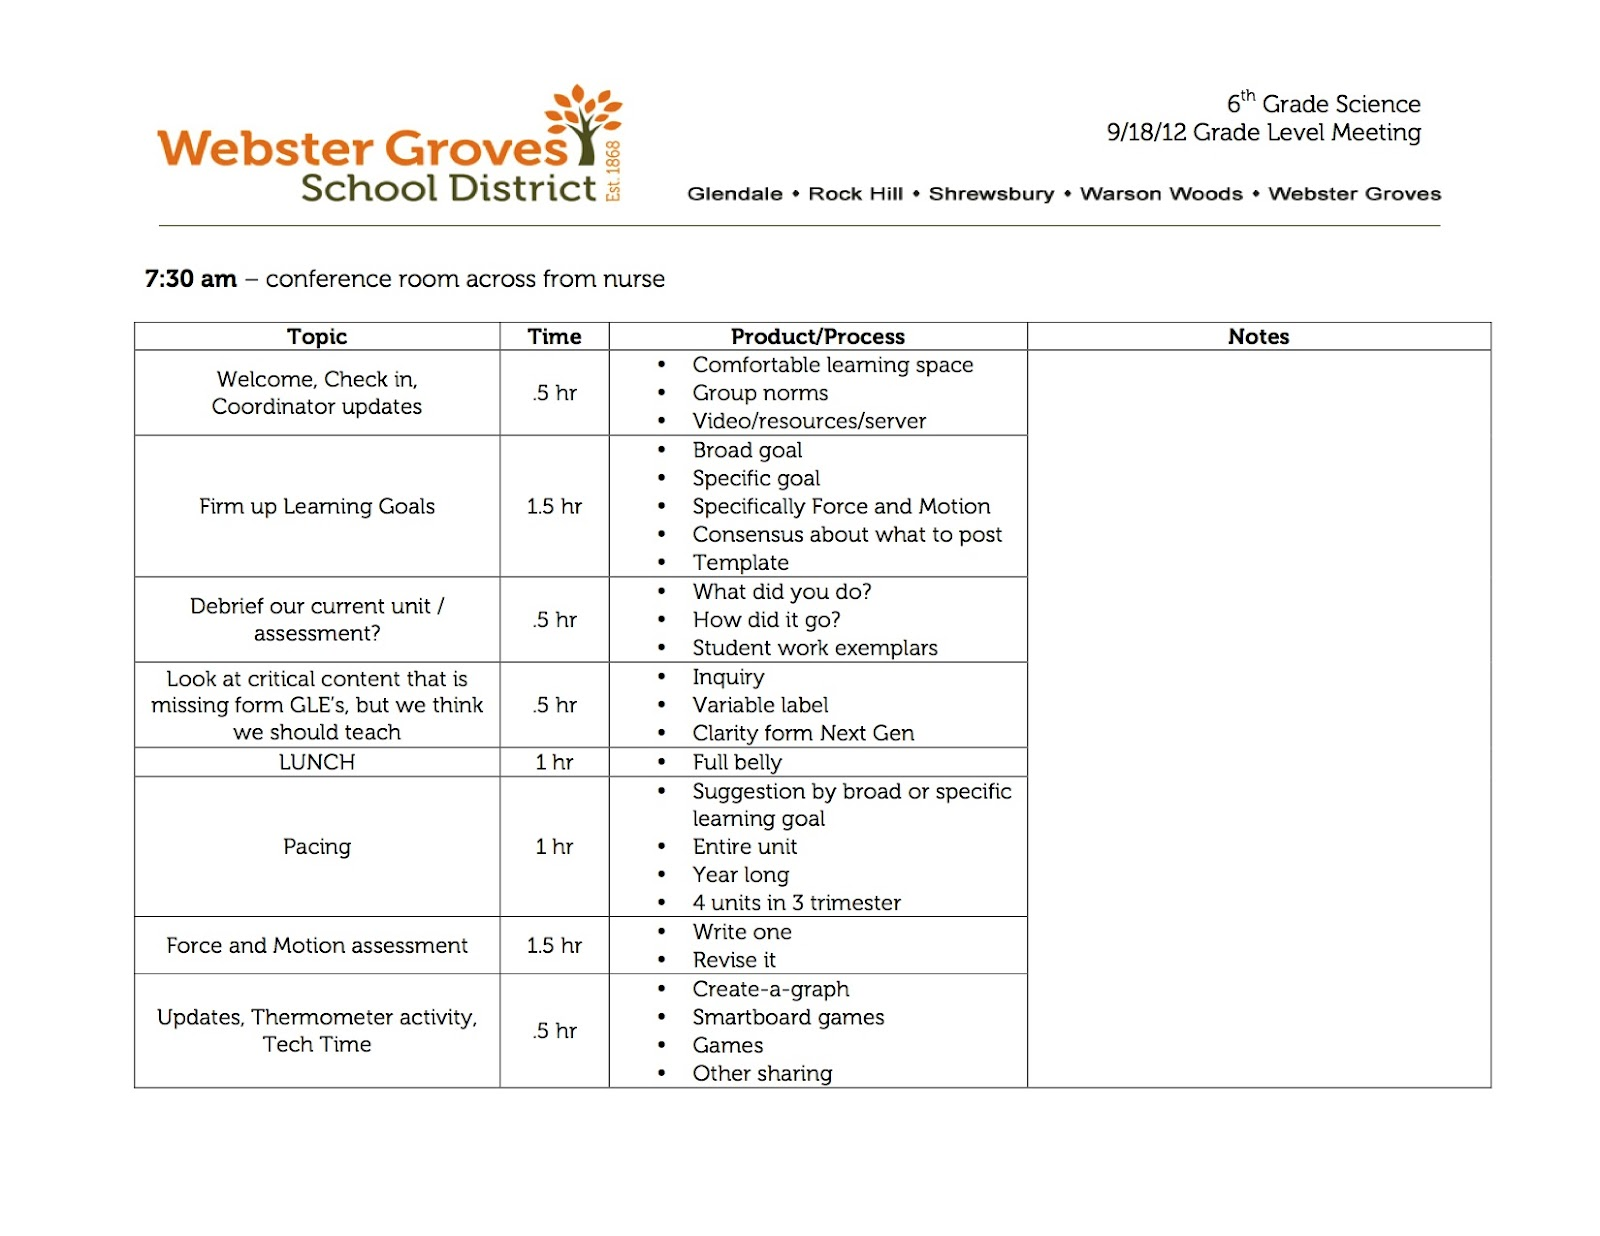 Department Meeting Agenda